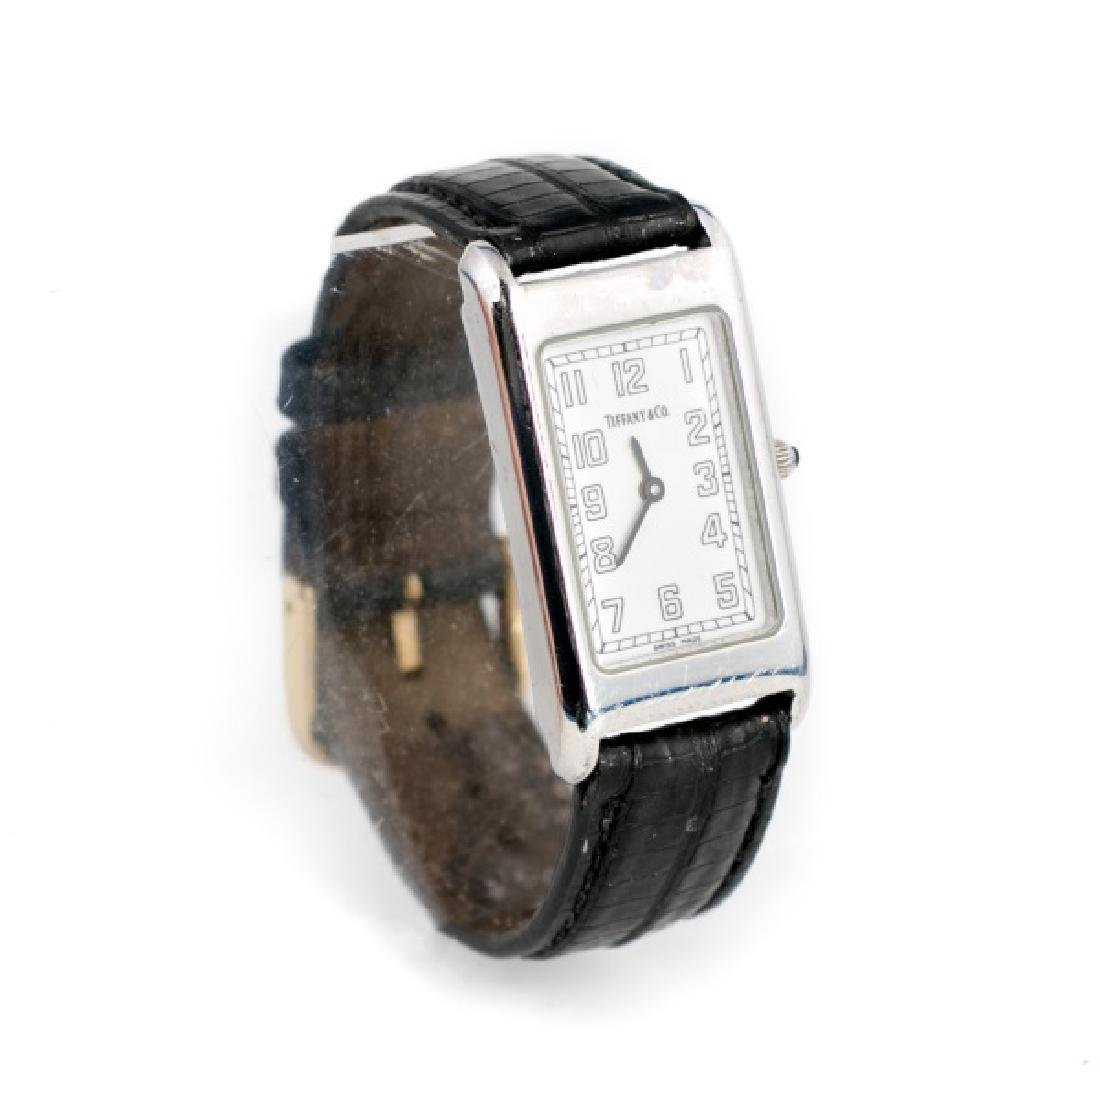 Tiffany & Co. Black Leather Wrist Watch